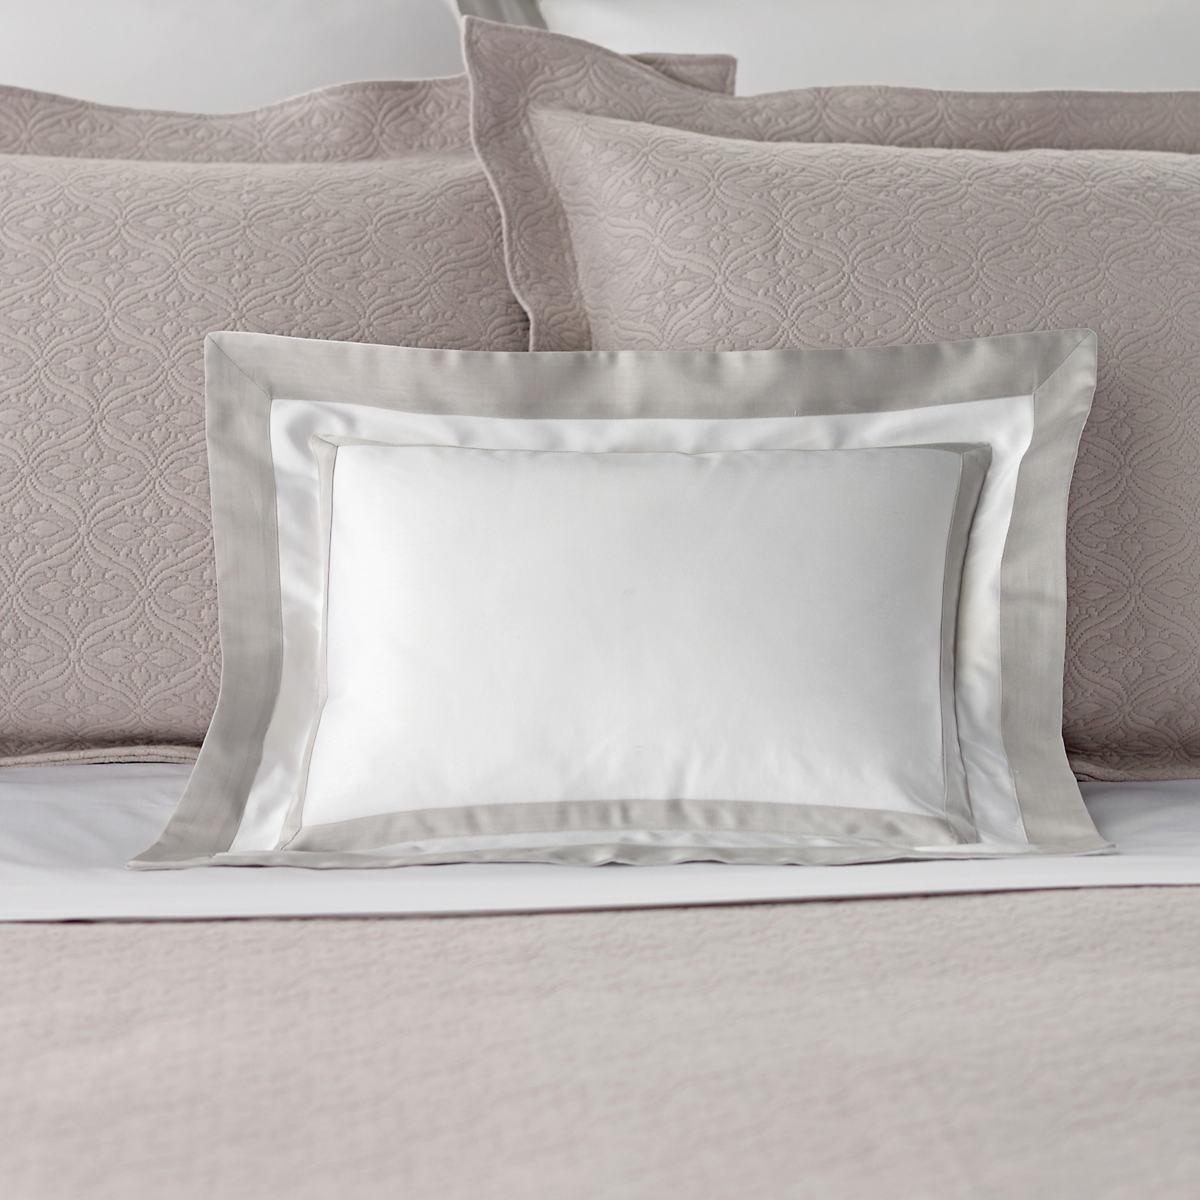 Piazza White/Zinc Decorative Pillow